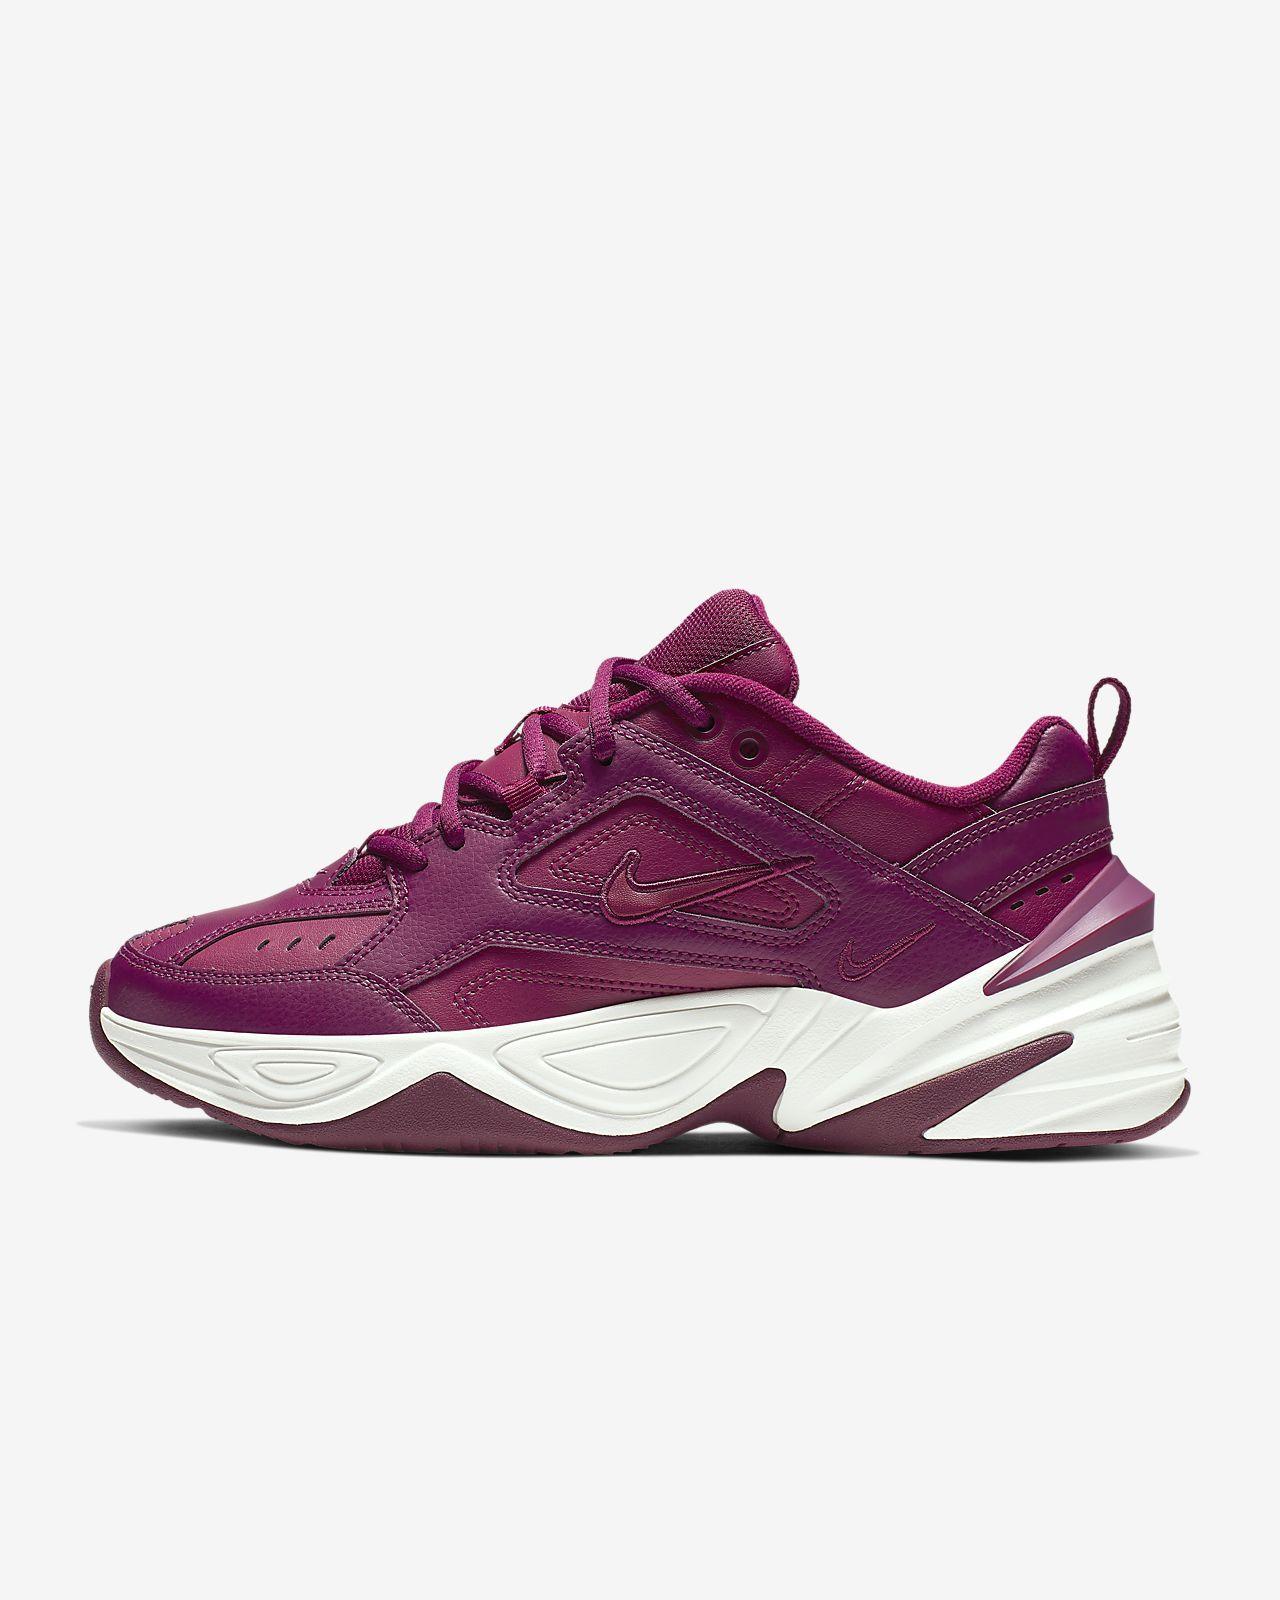 chaussure nike m2k tekno femme